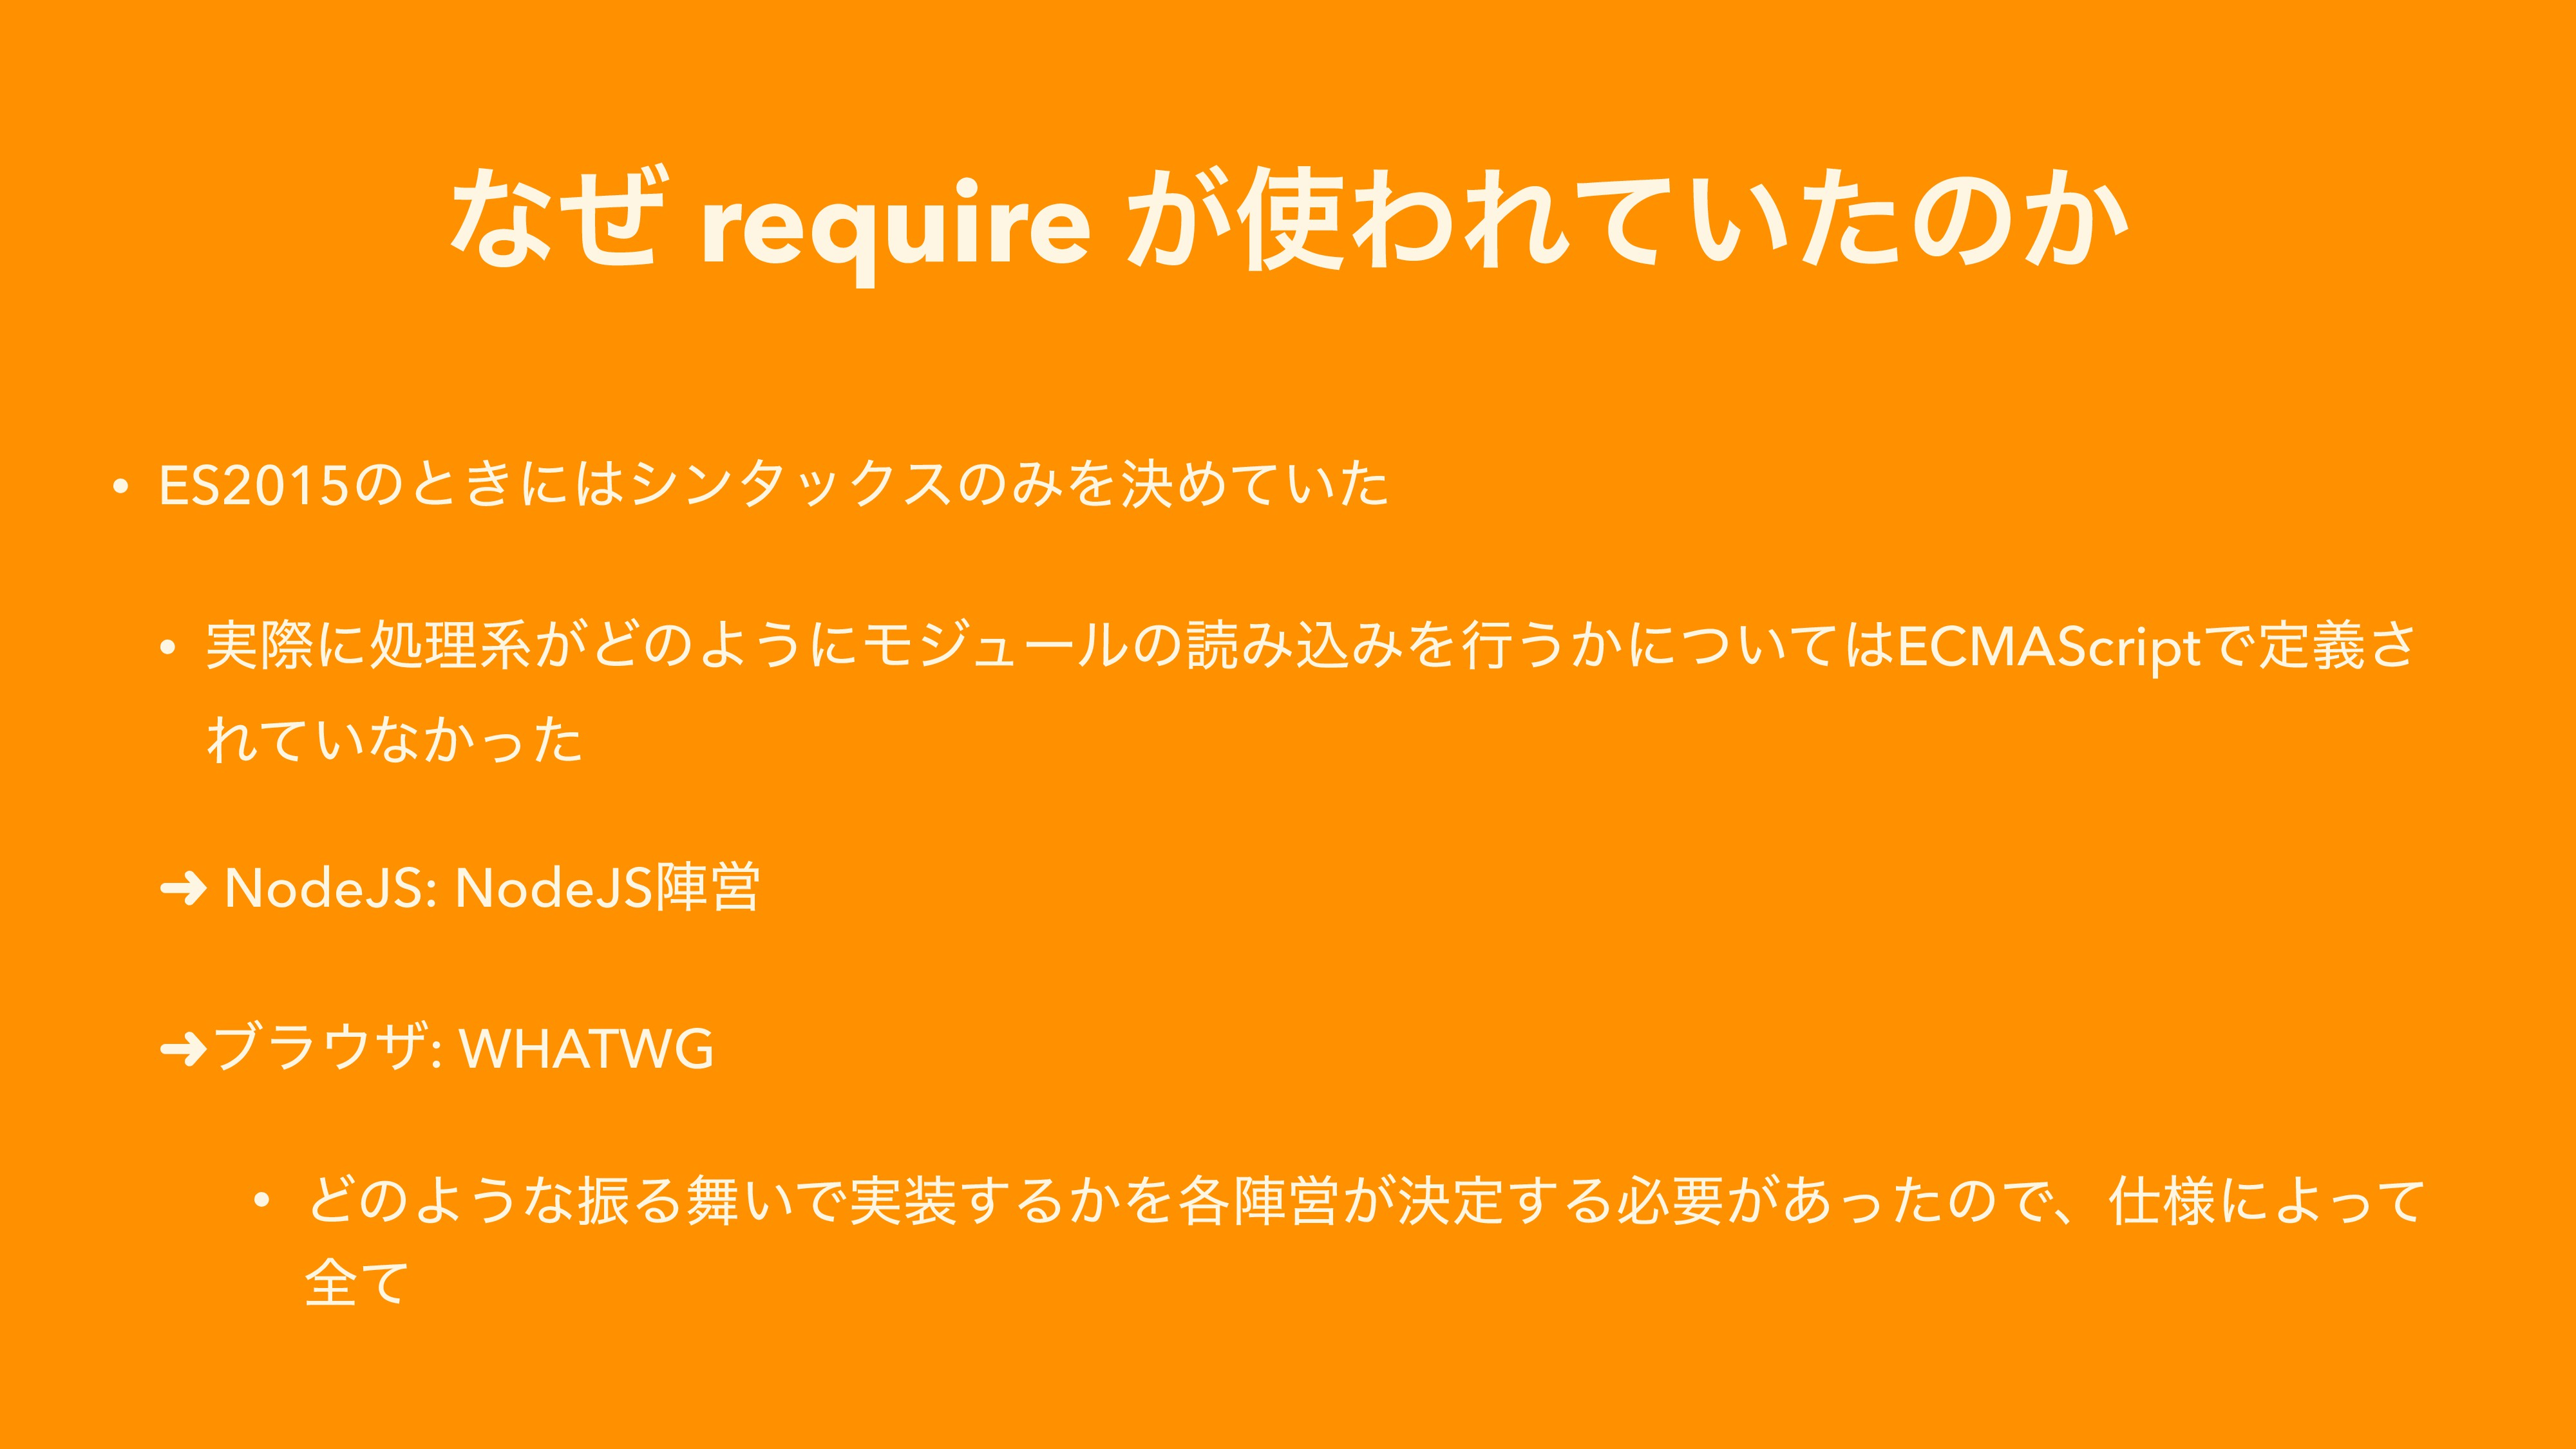 ͳͥ require ͕ΘΕ͍ͯͨͷ͔ • ES2015ͷͱ͖ʹγϯλοΫεͷΈΛܾΊ͍ͯ...